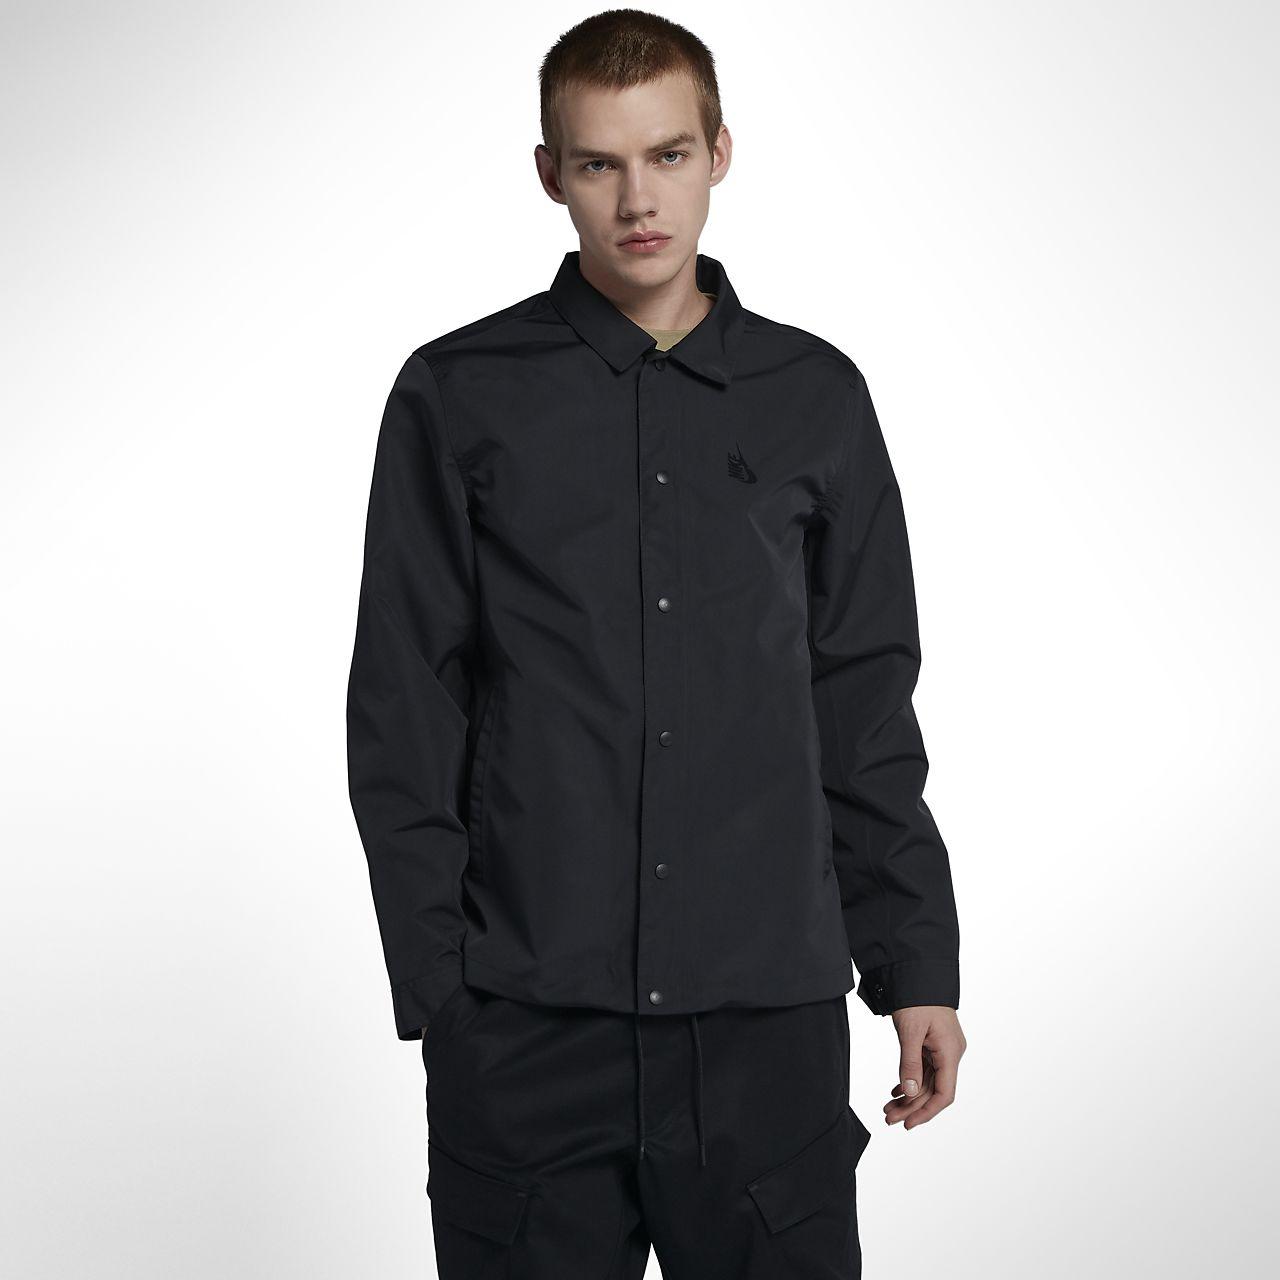 NikeLab Collection Coaches Men's Jacket